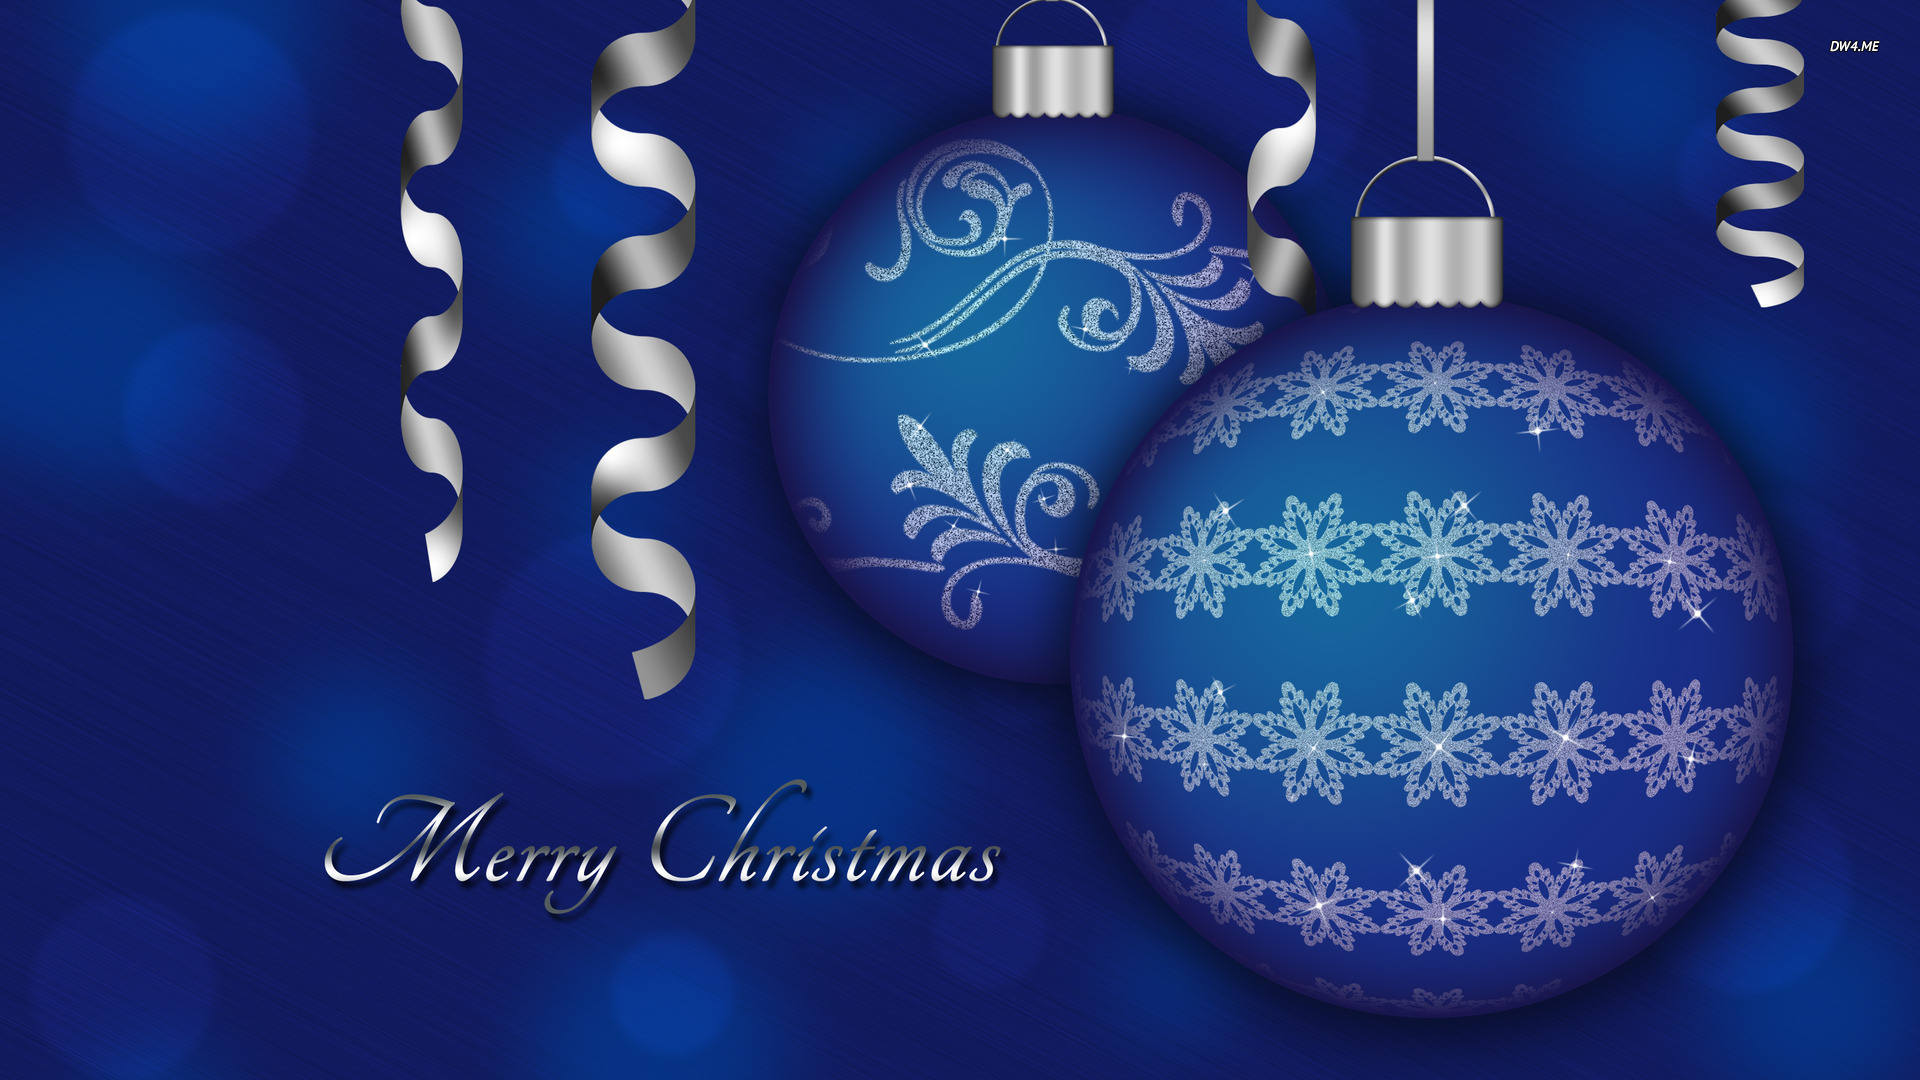 Ideas About Christmas Desktop Wallpaper On Pinterest Merry Christmas Blue Ornaments 1920x1080 Wallpaper Teahub Io